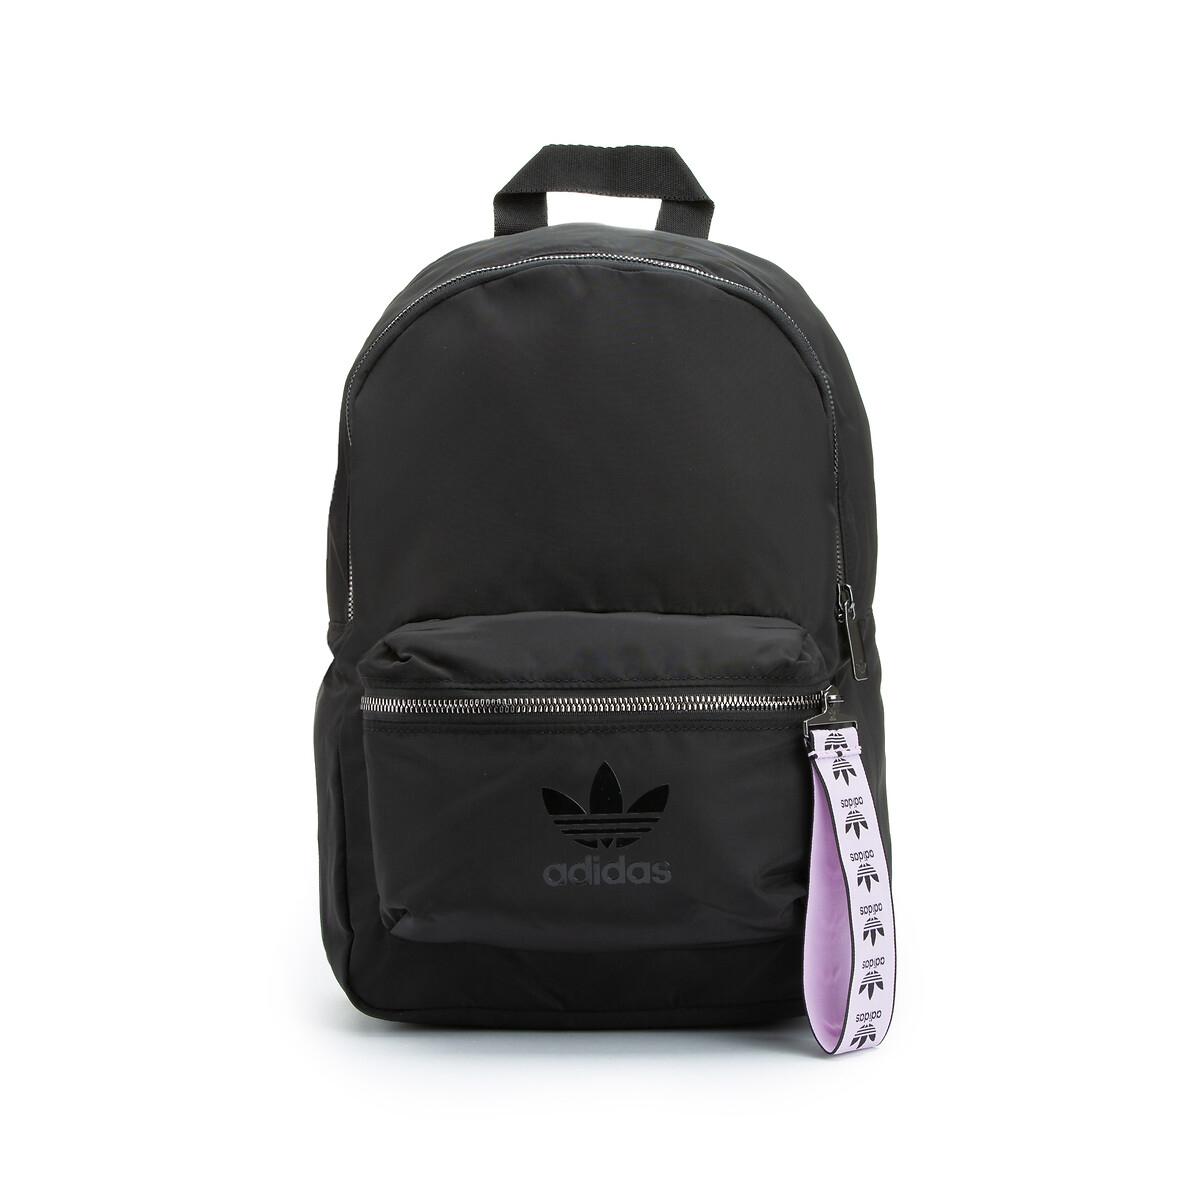 An image of Adidas Originals Girls Nylon W Bp Backpack